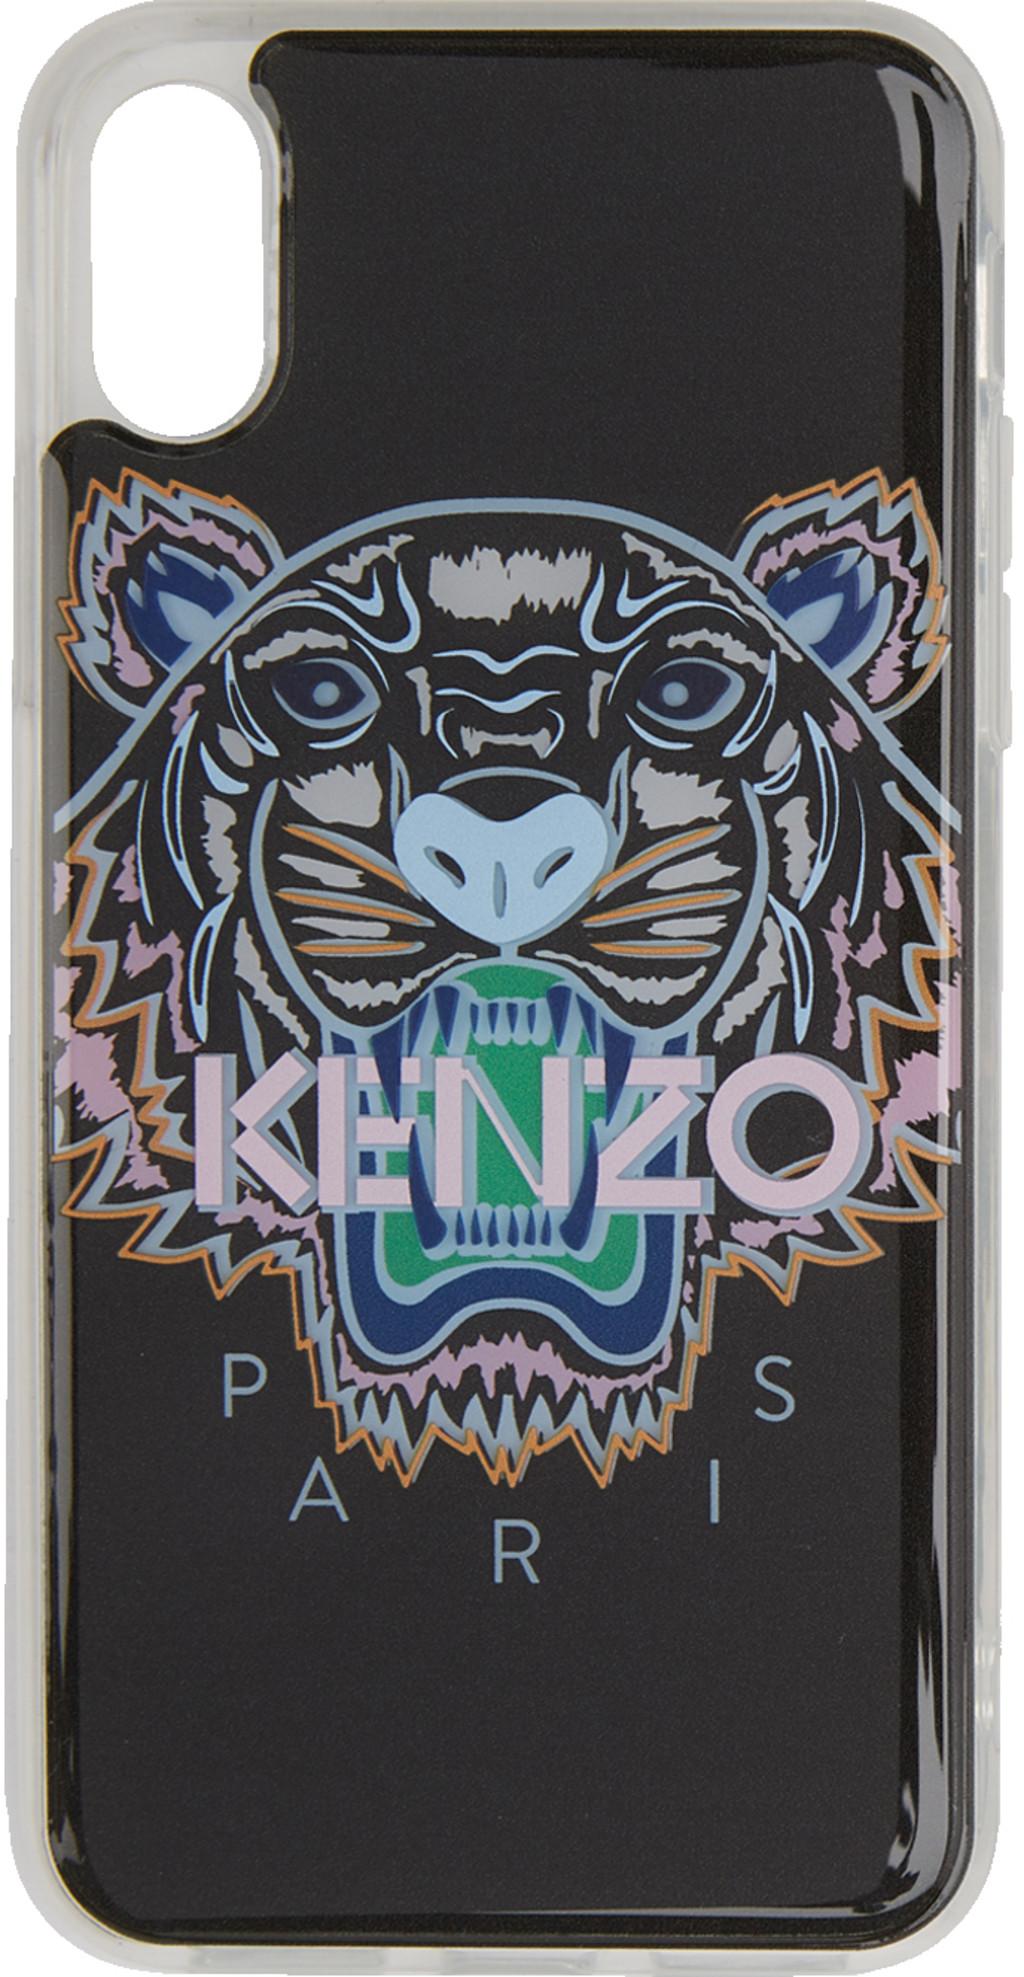 babdf6dc Kenzo iphone cases for Men | SSENSE Canada